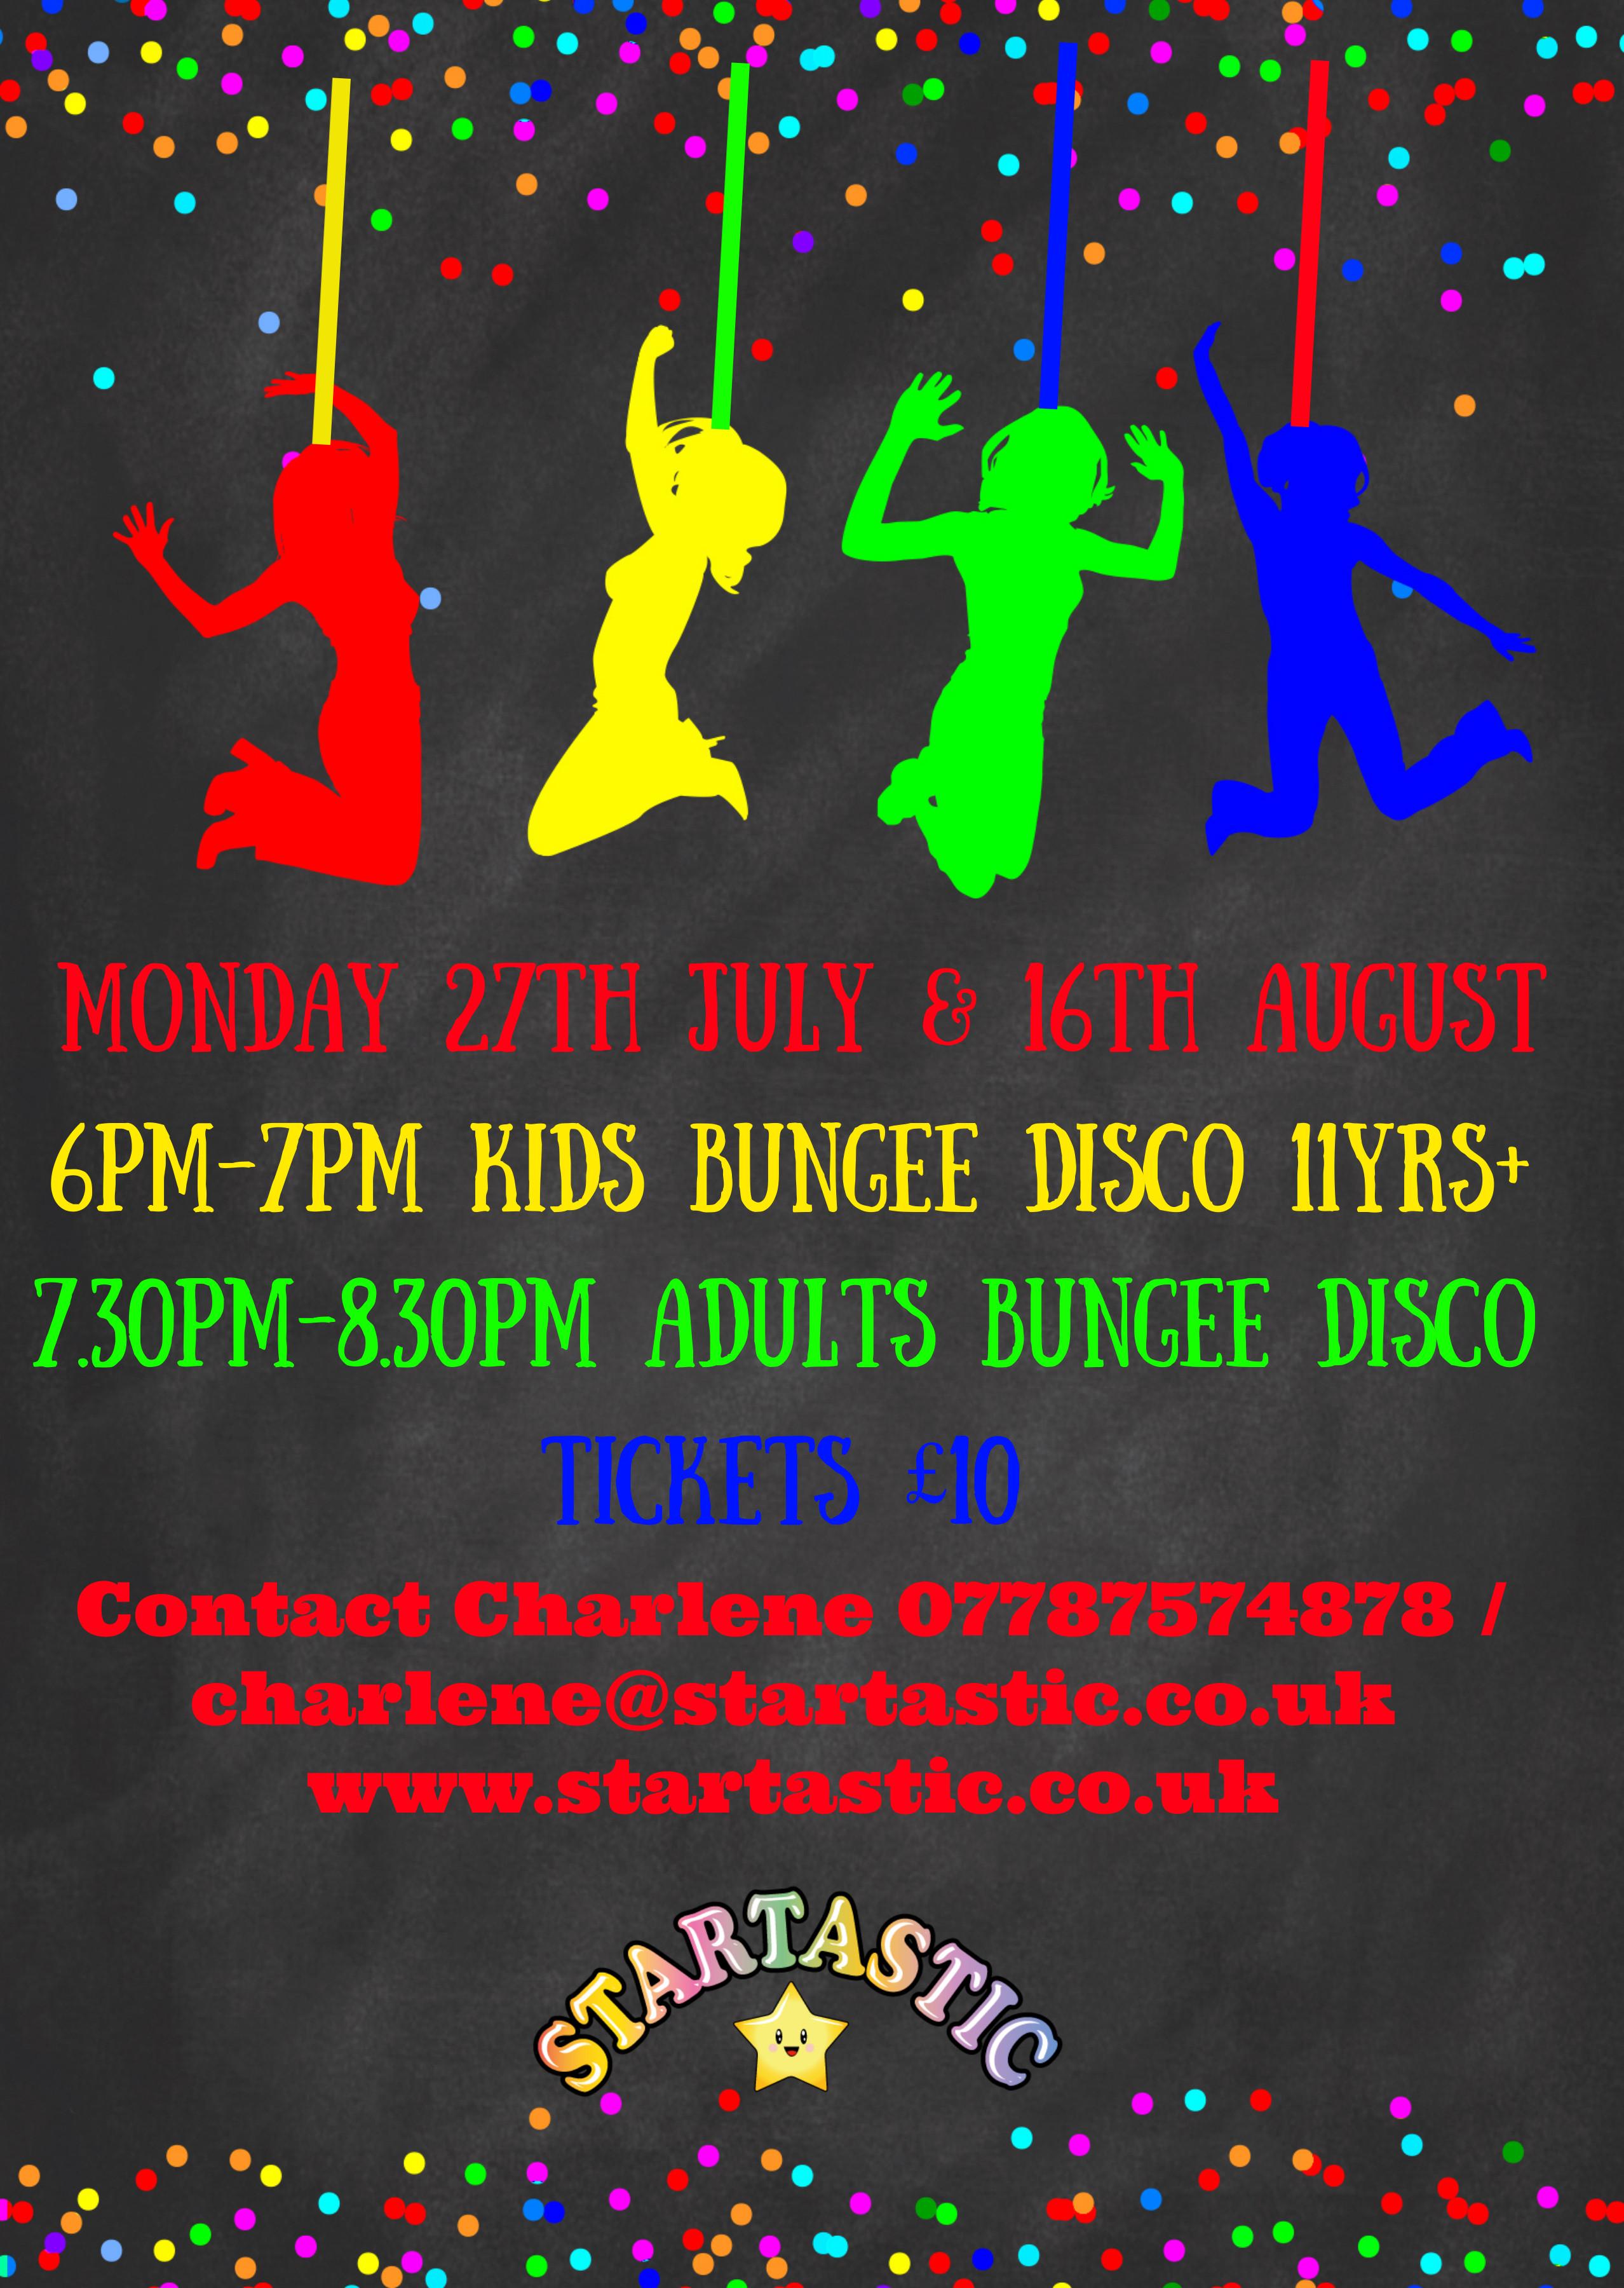 Childrens Bungee Disco